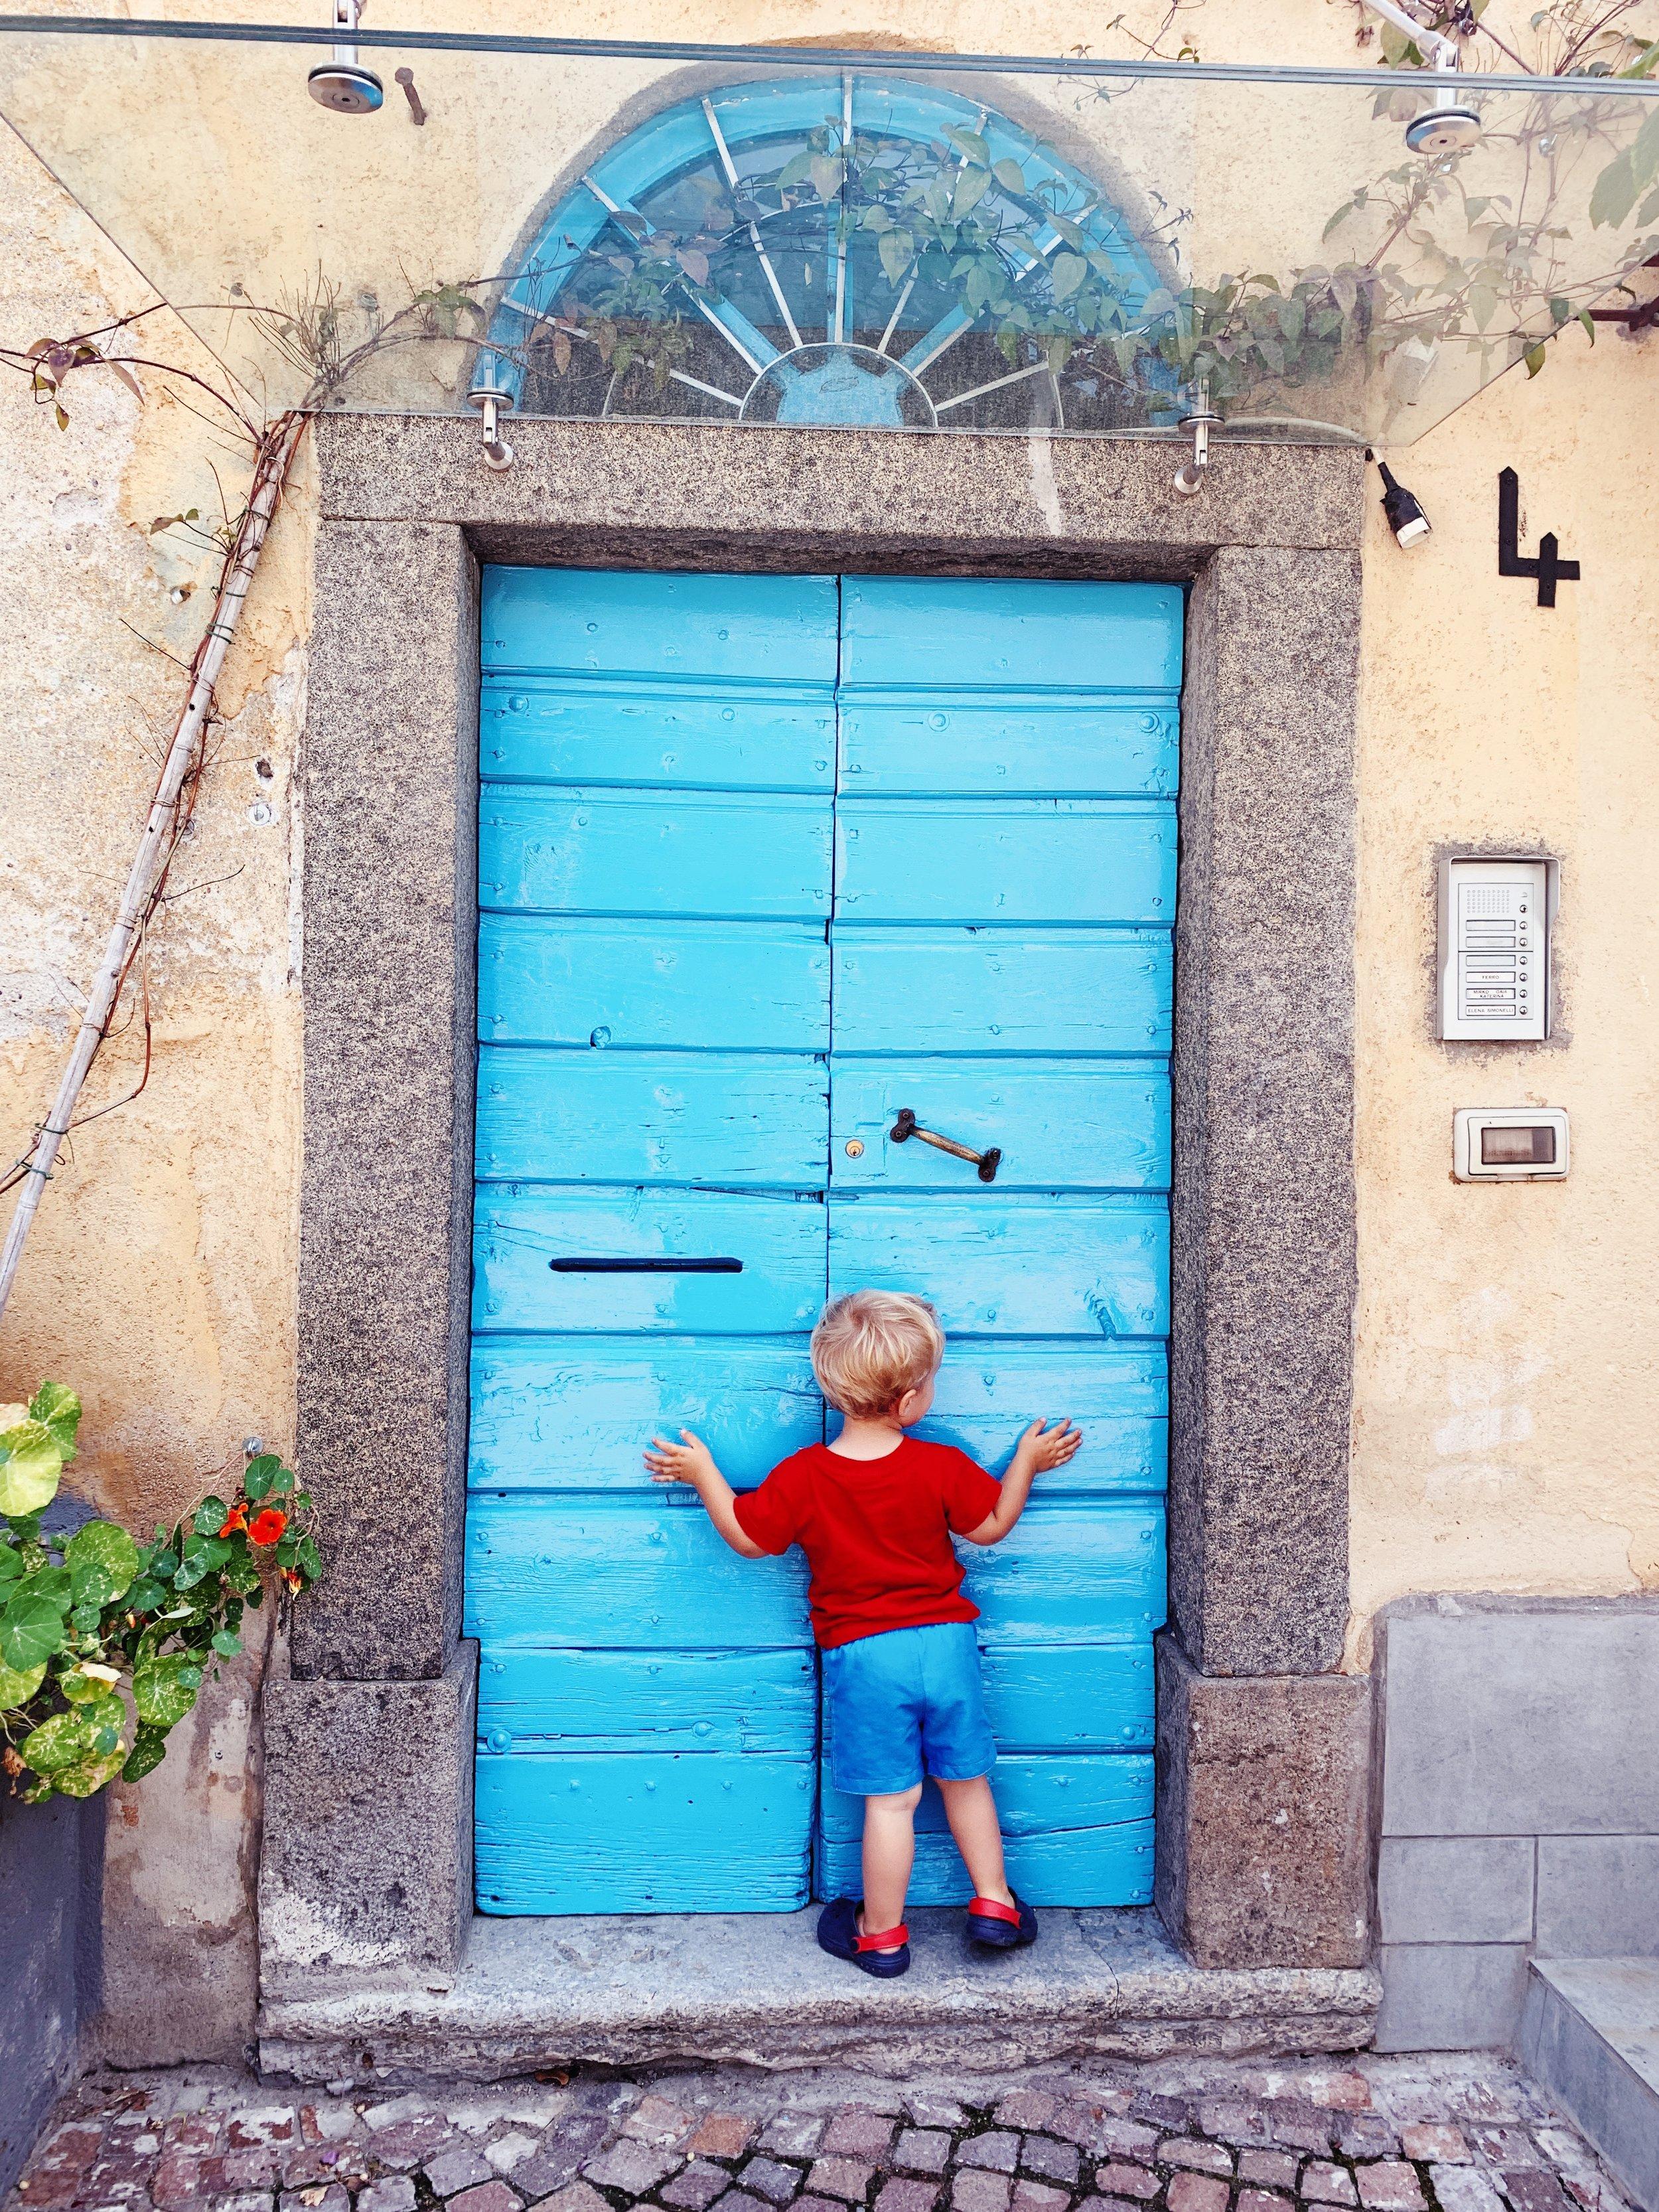 Finding beautiful doors